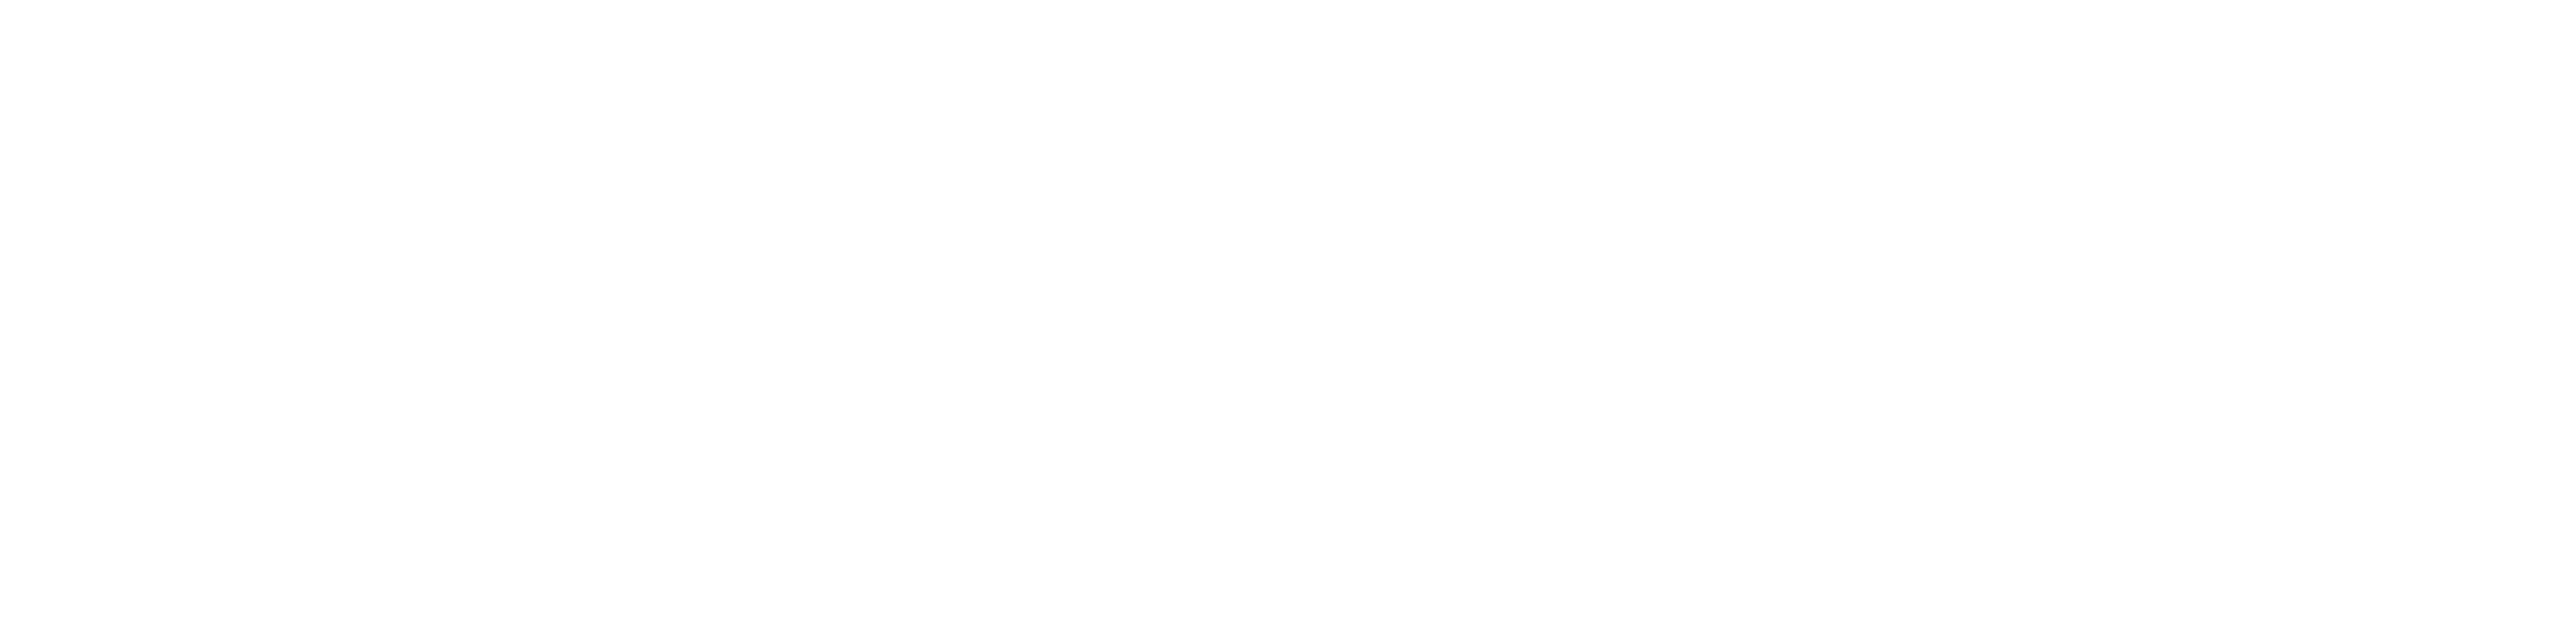 Women in Wealth Management Awards 2018